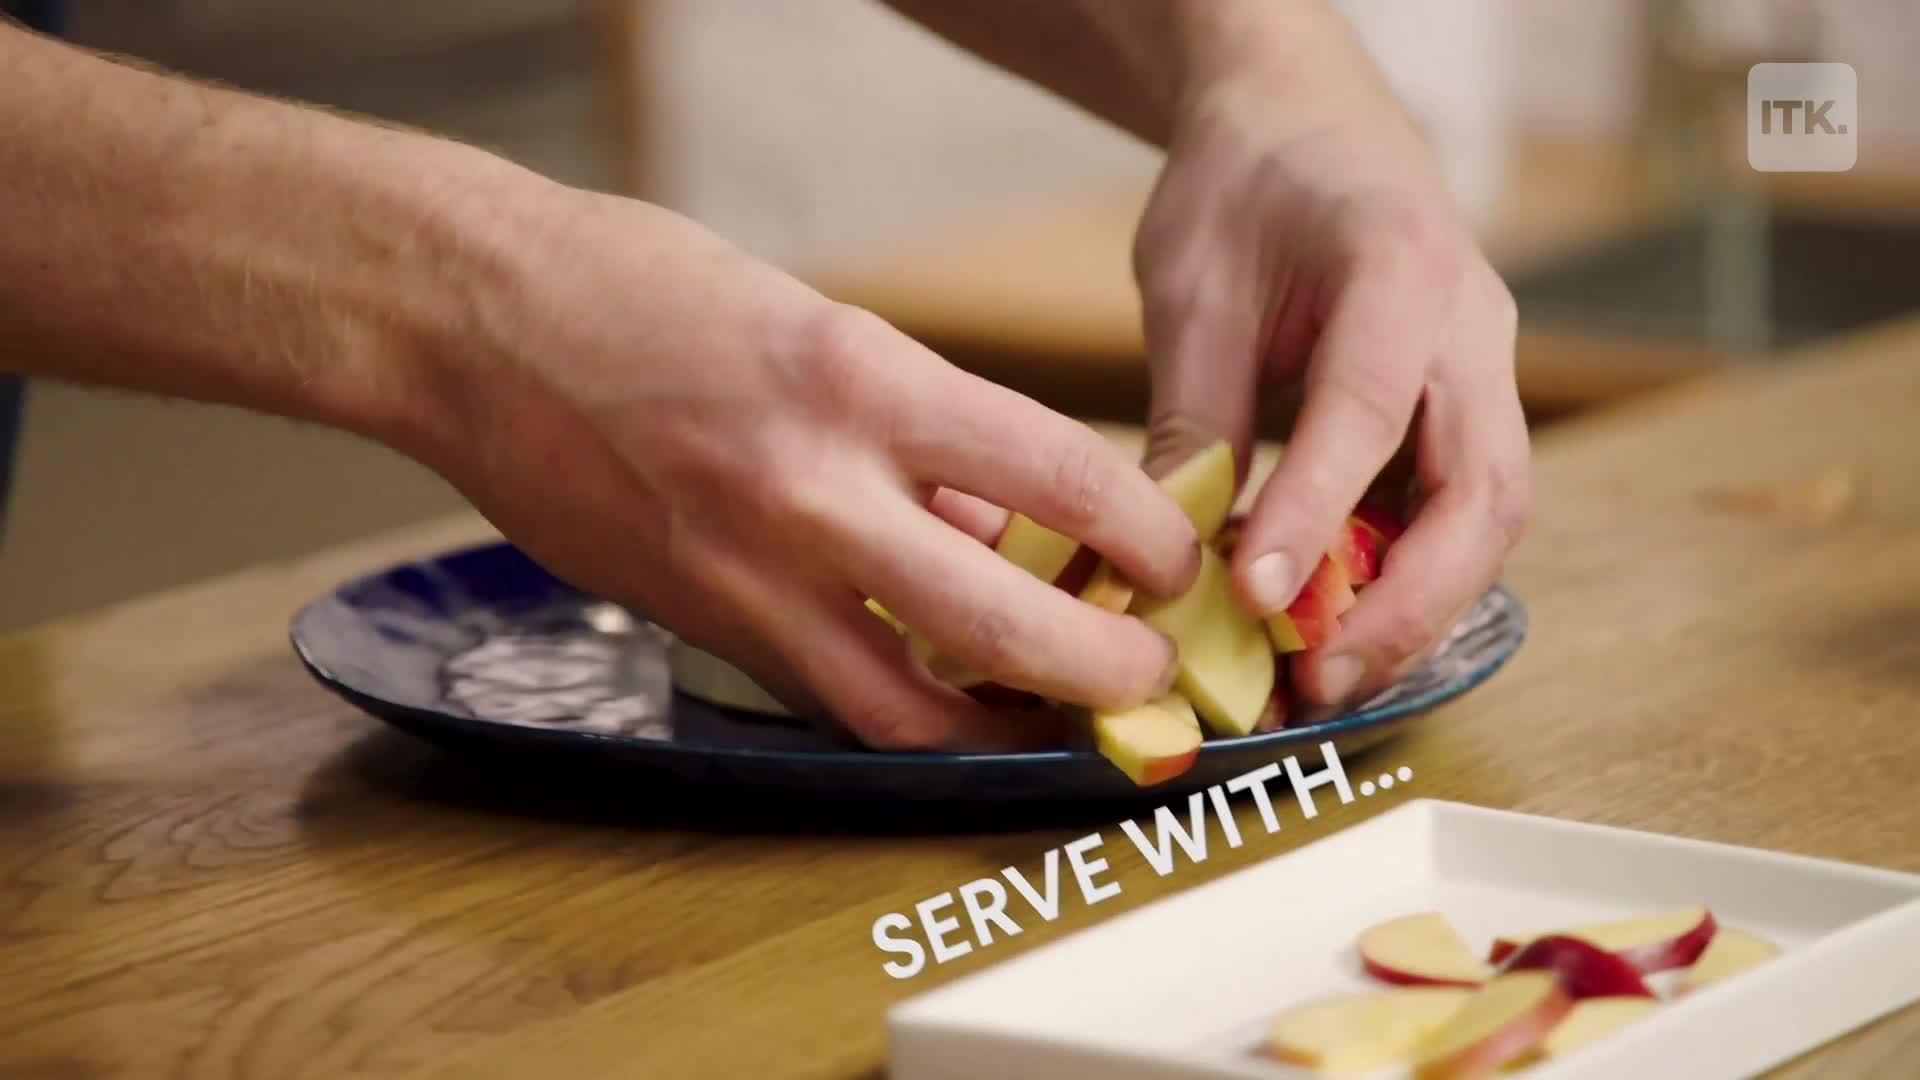 4ingredient garlic baked brie